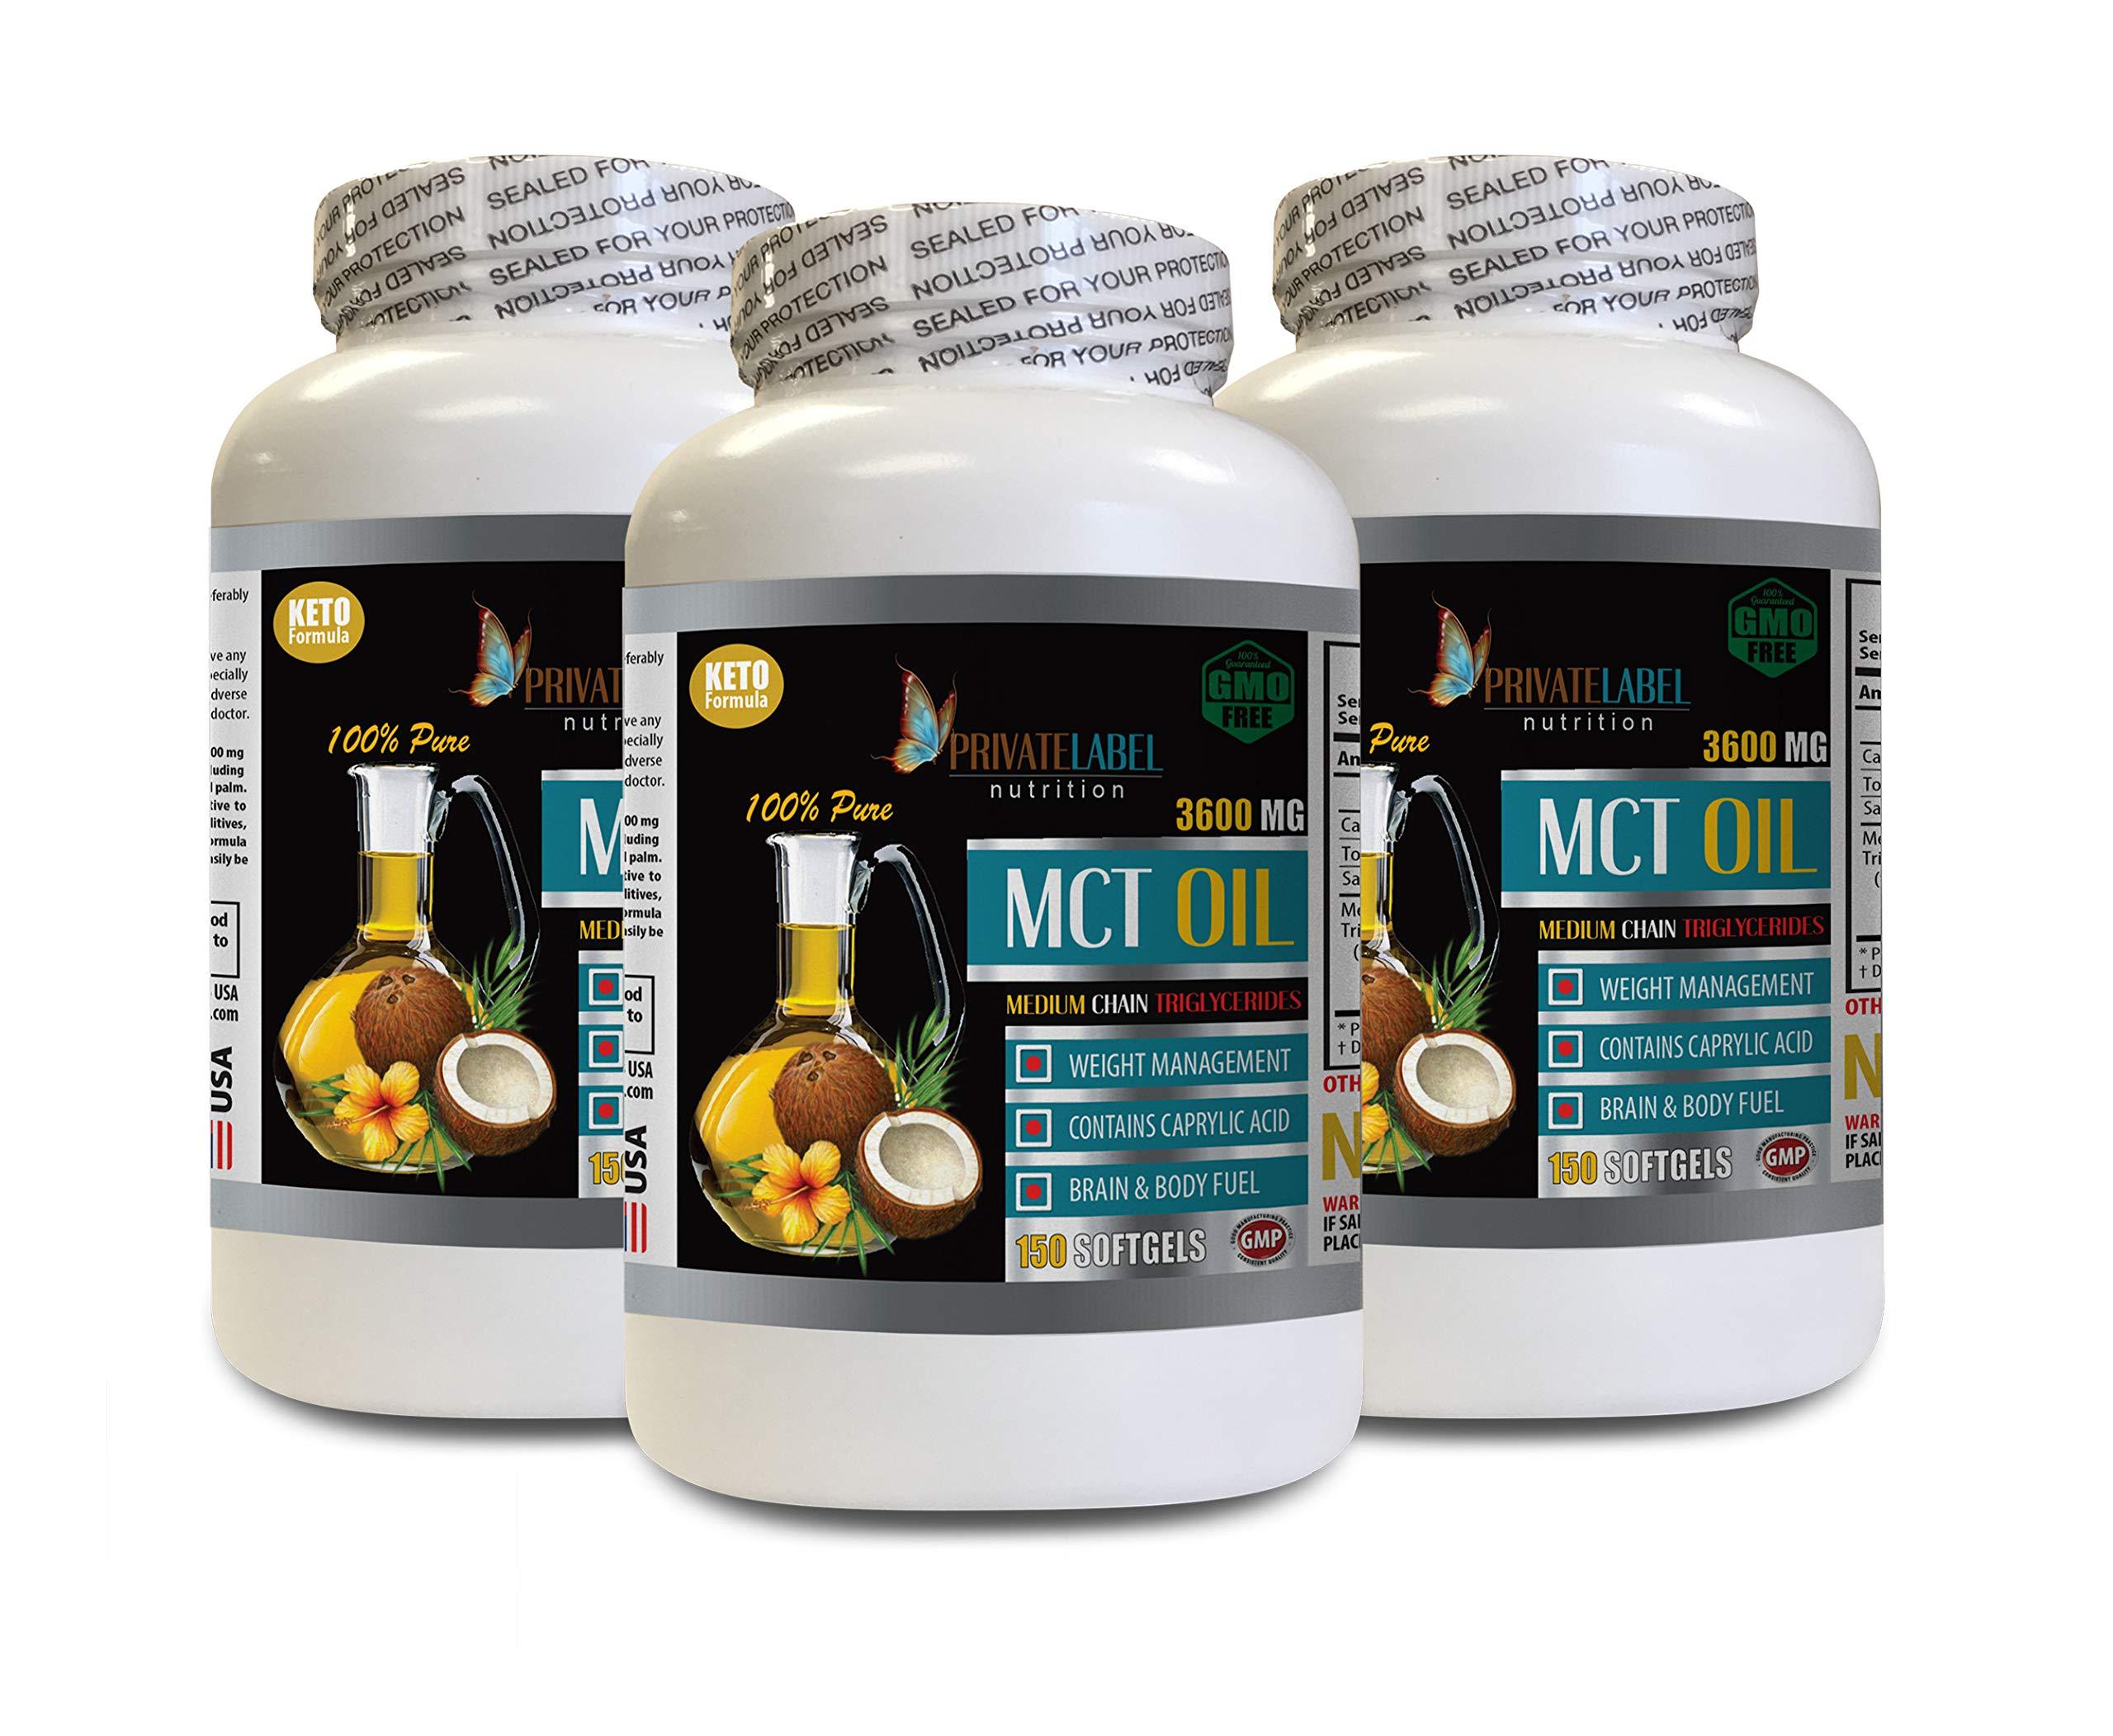 Immune System Vitamins - MCT Oil 3600MG - Medium Chain TRIGLYCERIDES - mct Oil lauric Acid - 3 Bottles 450 Softgels